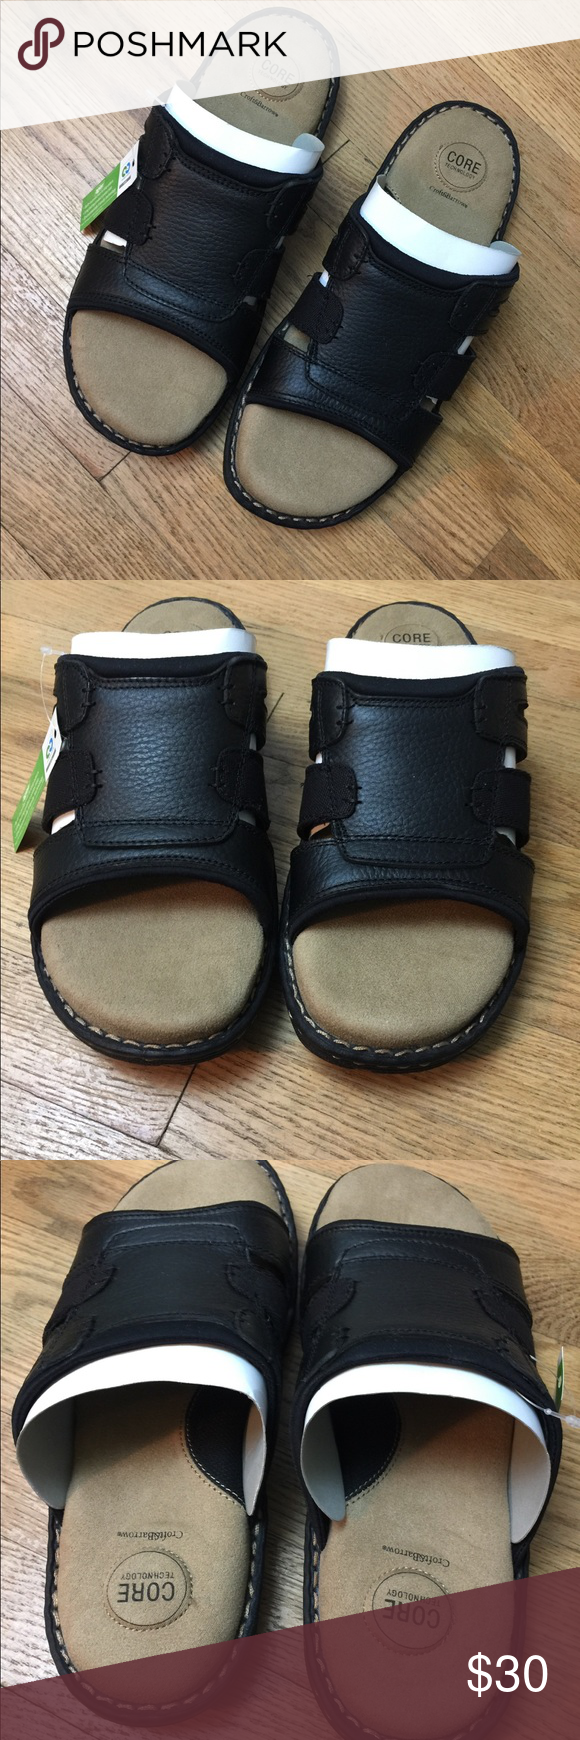 b0fb7c188ea8 Croft and Barrow Men s Clyde Slide Style Sandals New in box men s slide  style sandals by